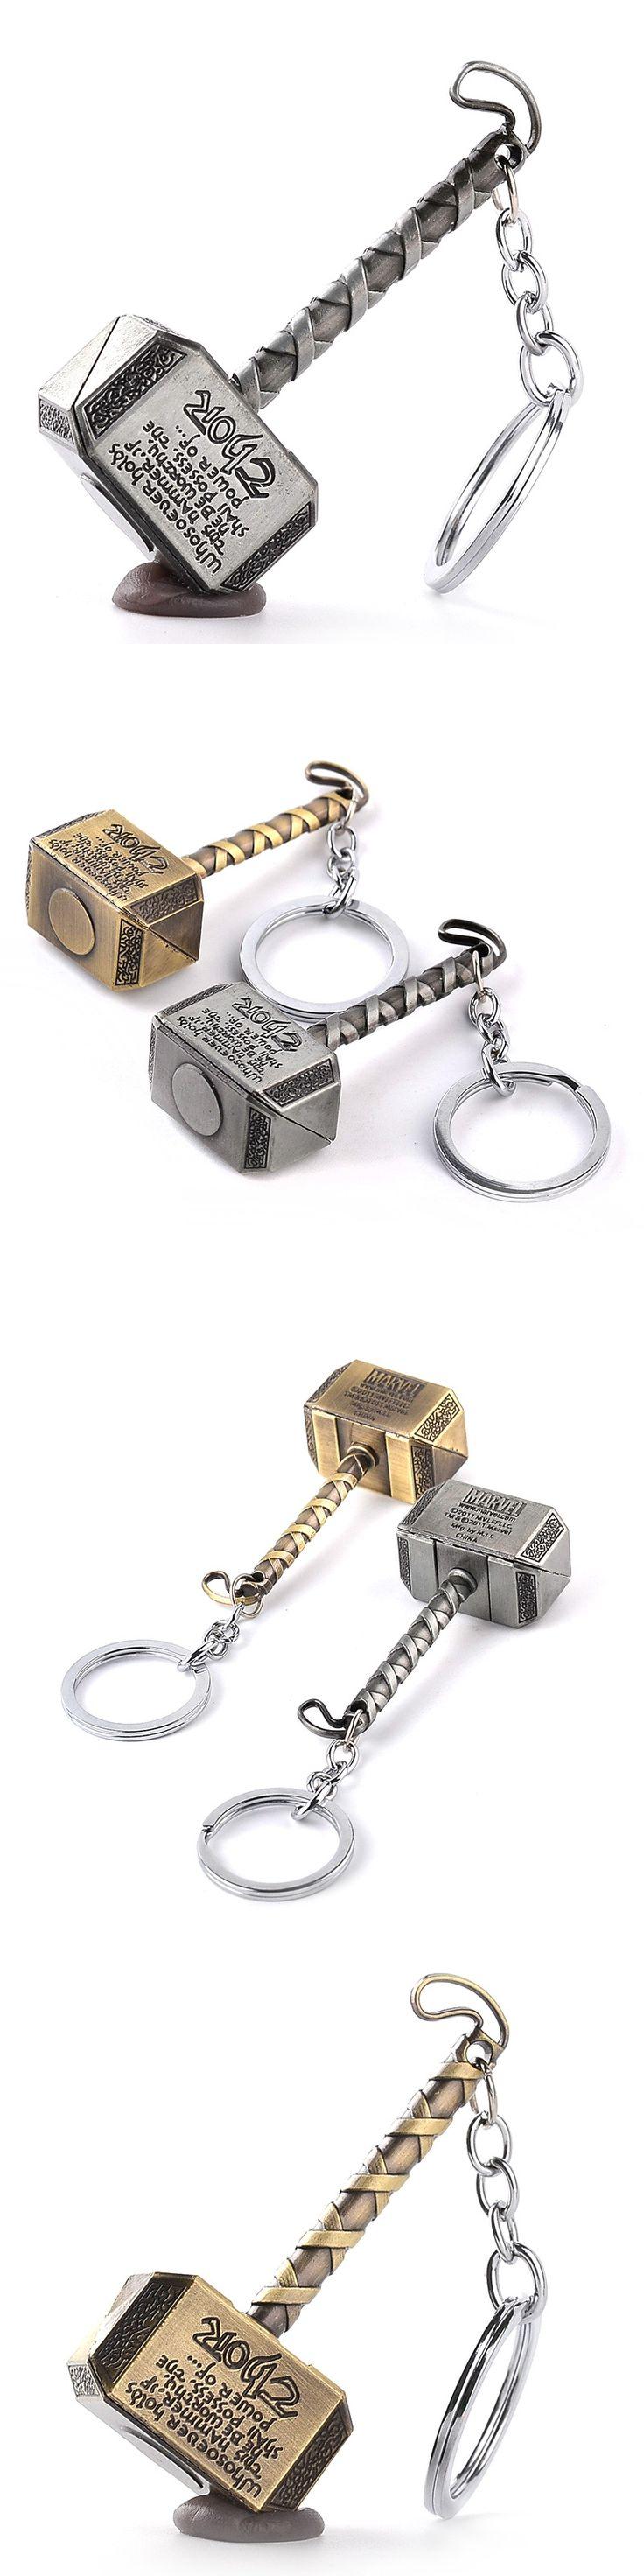 Vintage Thor Hammer Keychains Marvel Avengers Key Rings Movie Series Thor Key Holder Thor The Dark World Key Finder Bags Keyring